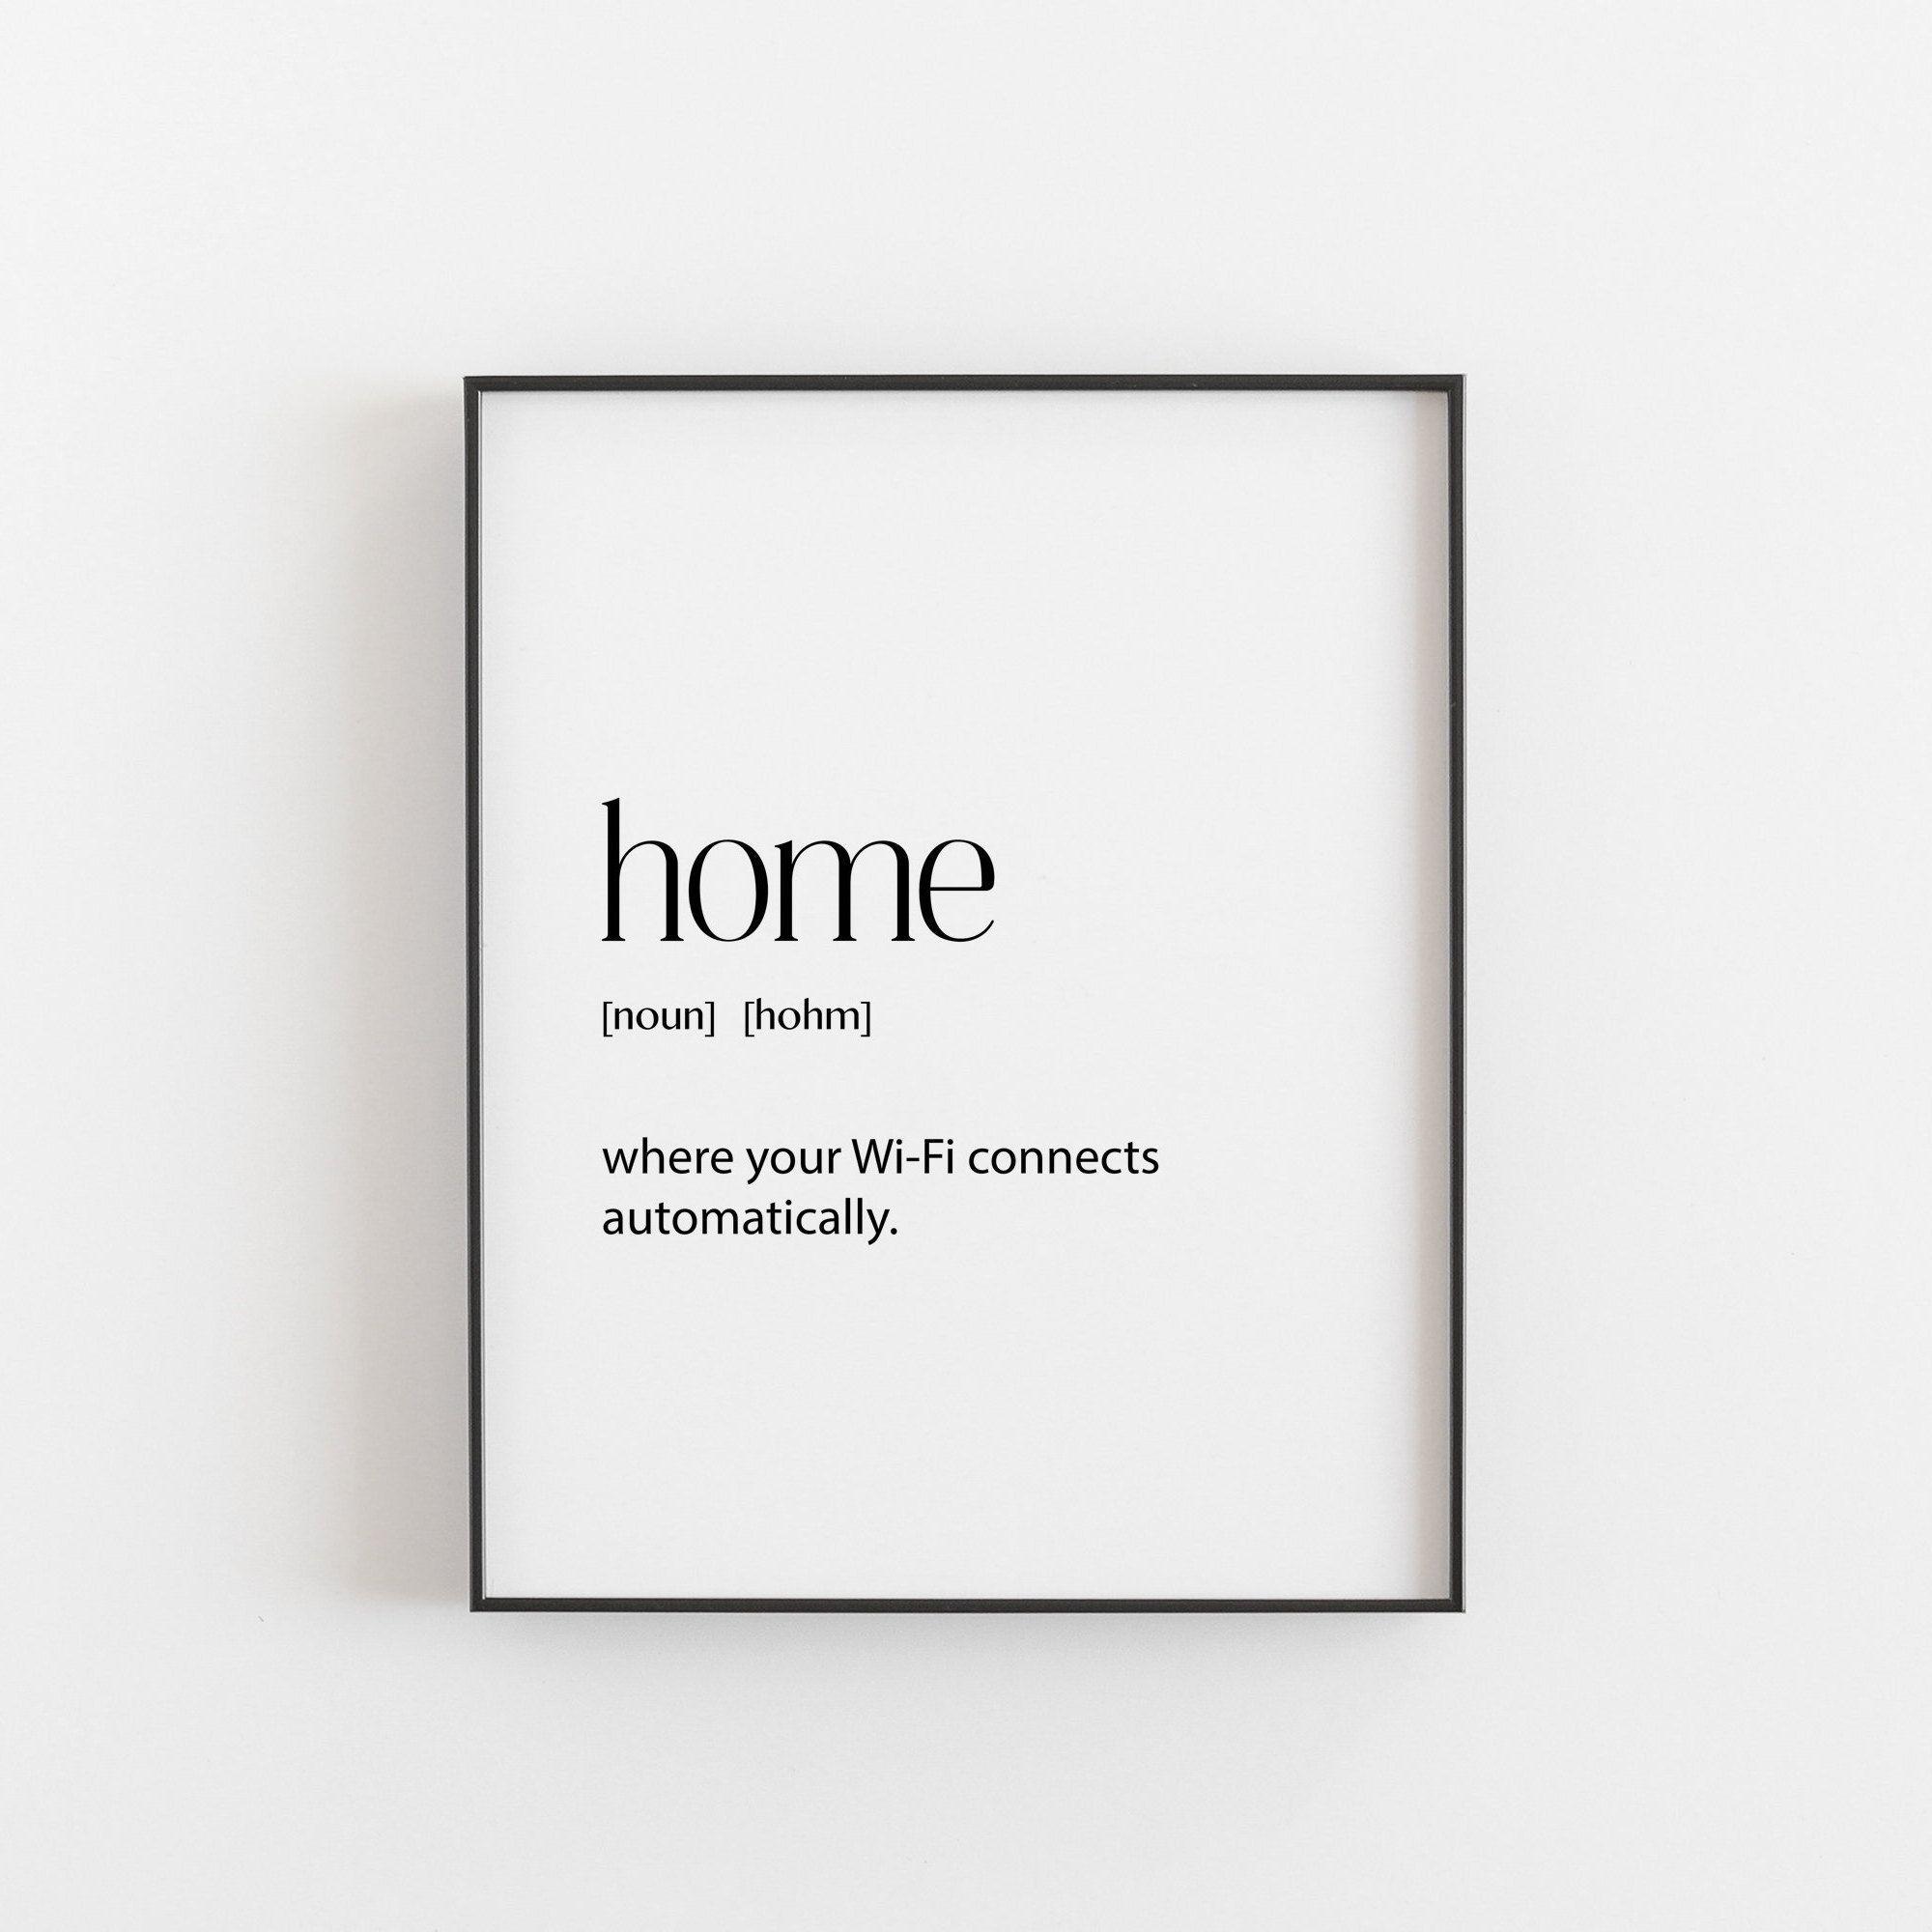 Wohnkultur New Home Wand Kunstdrucke herunterladbare